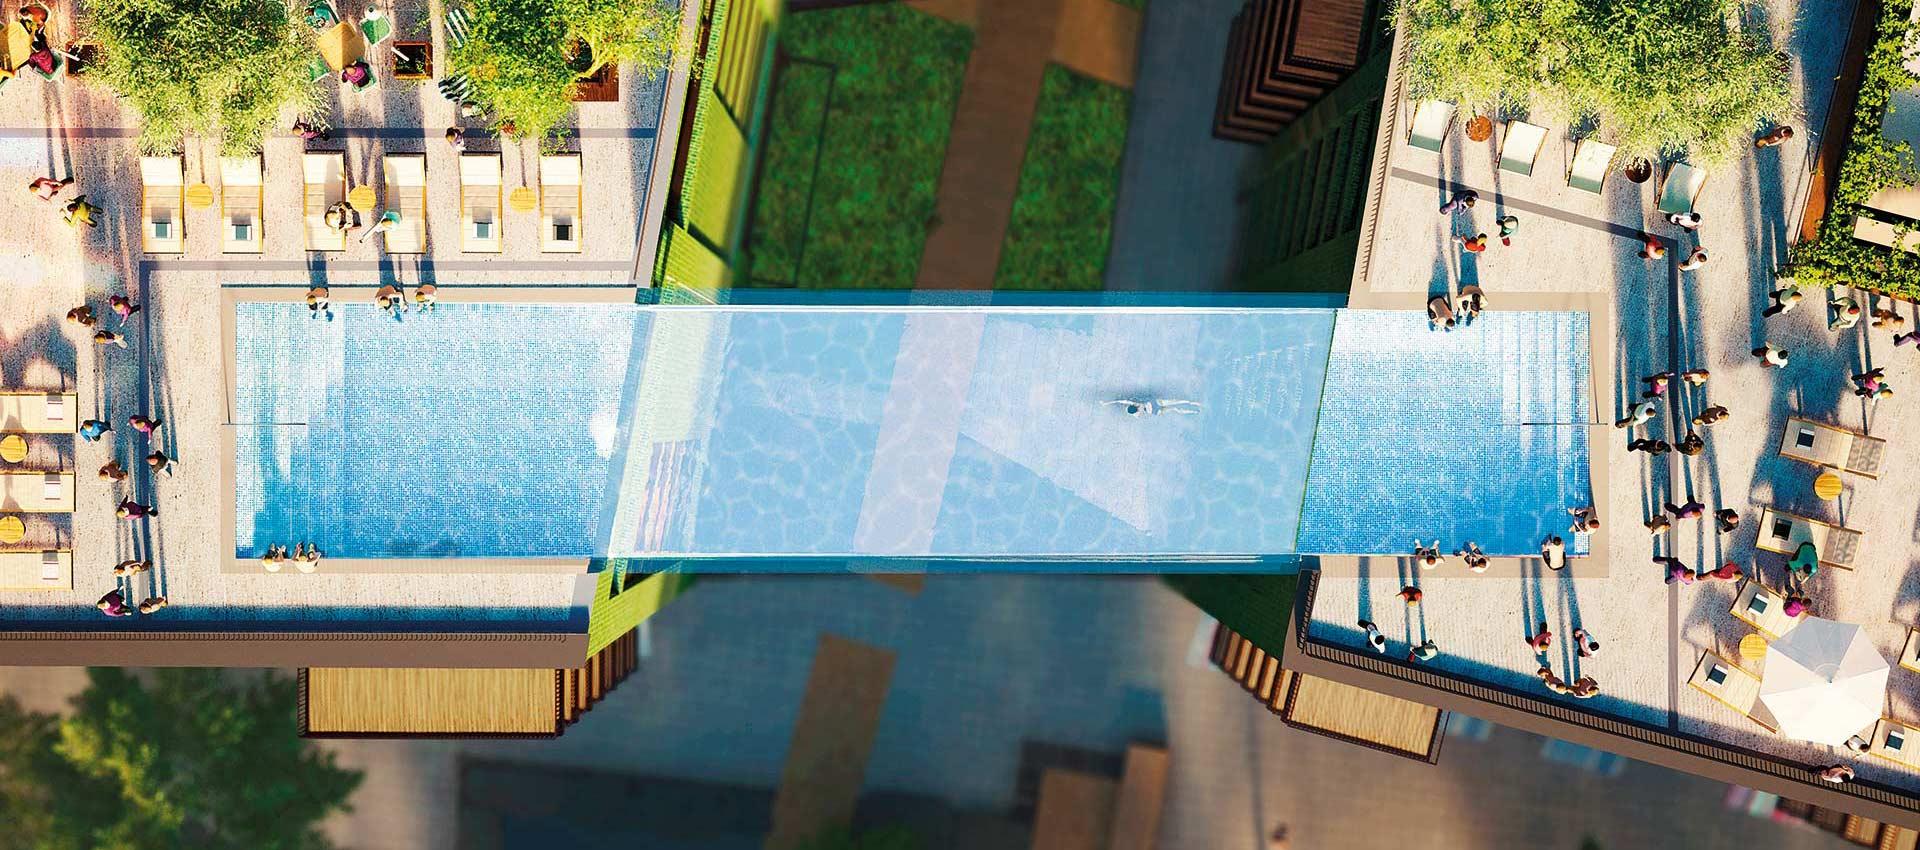 La Sky Pool vista dall'alto